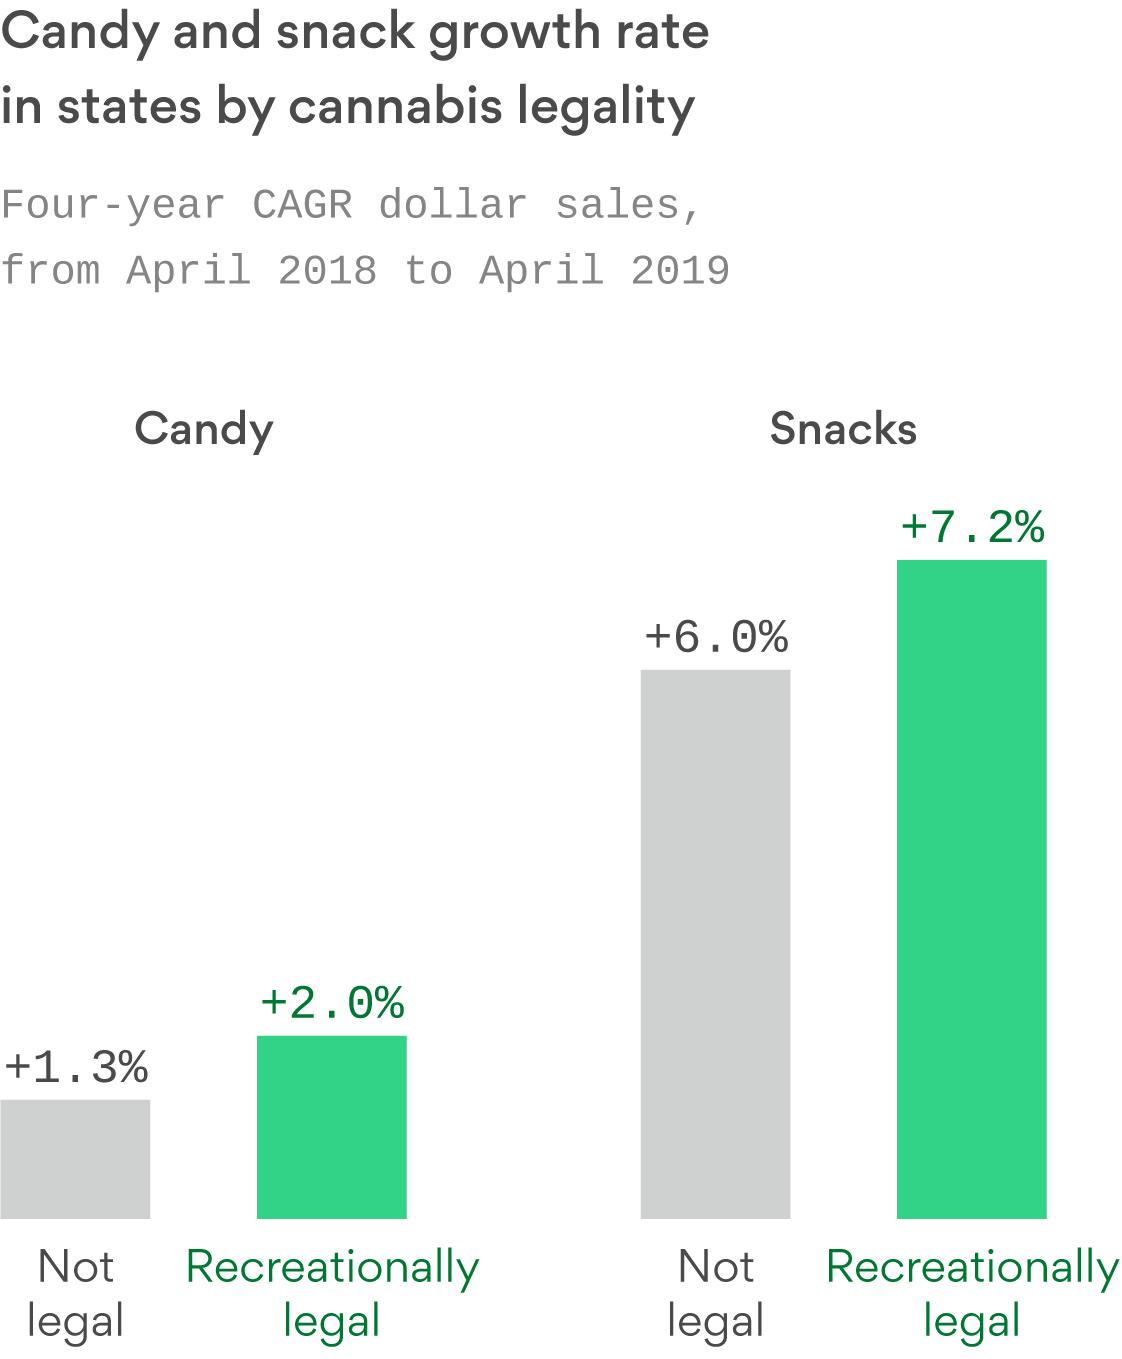 Legal marijuana looks to be boosting snack sales